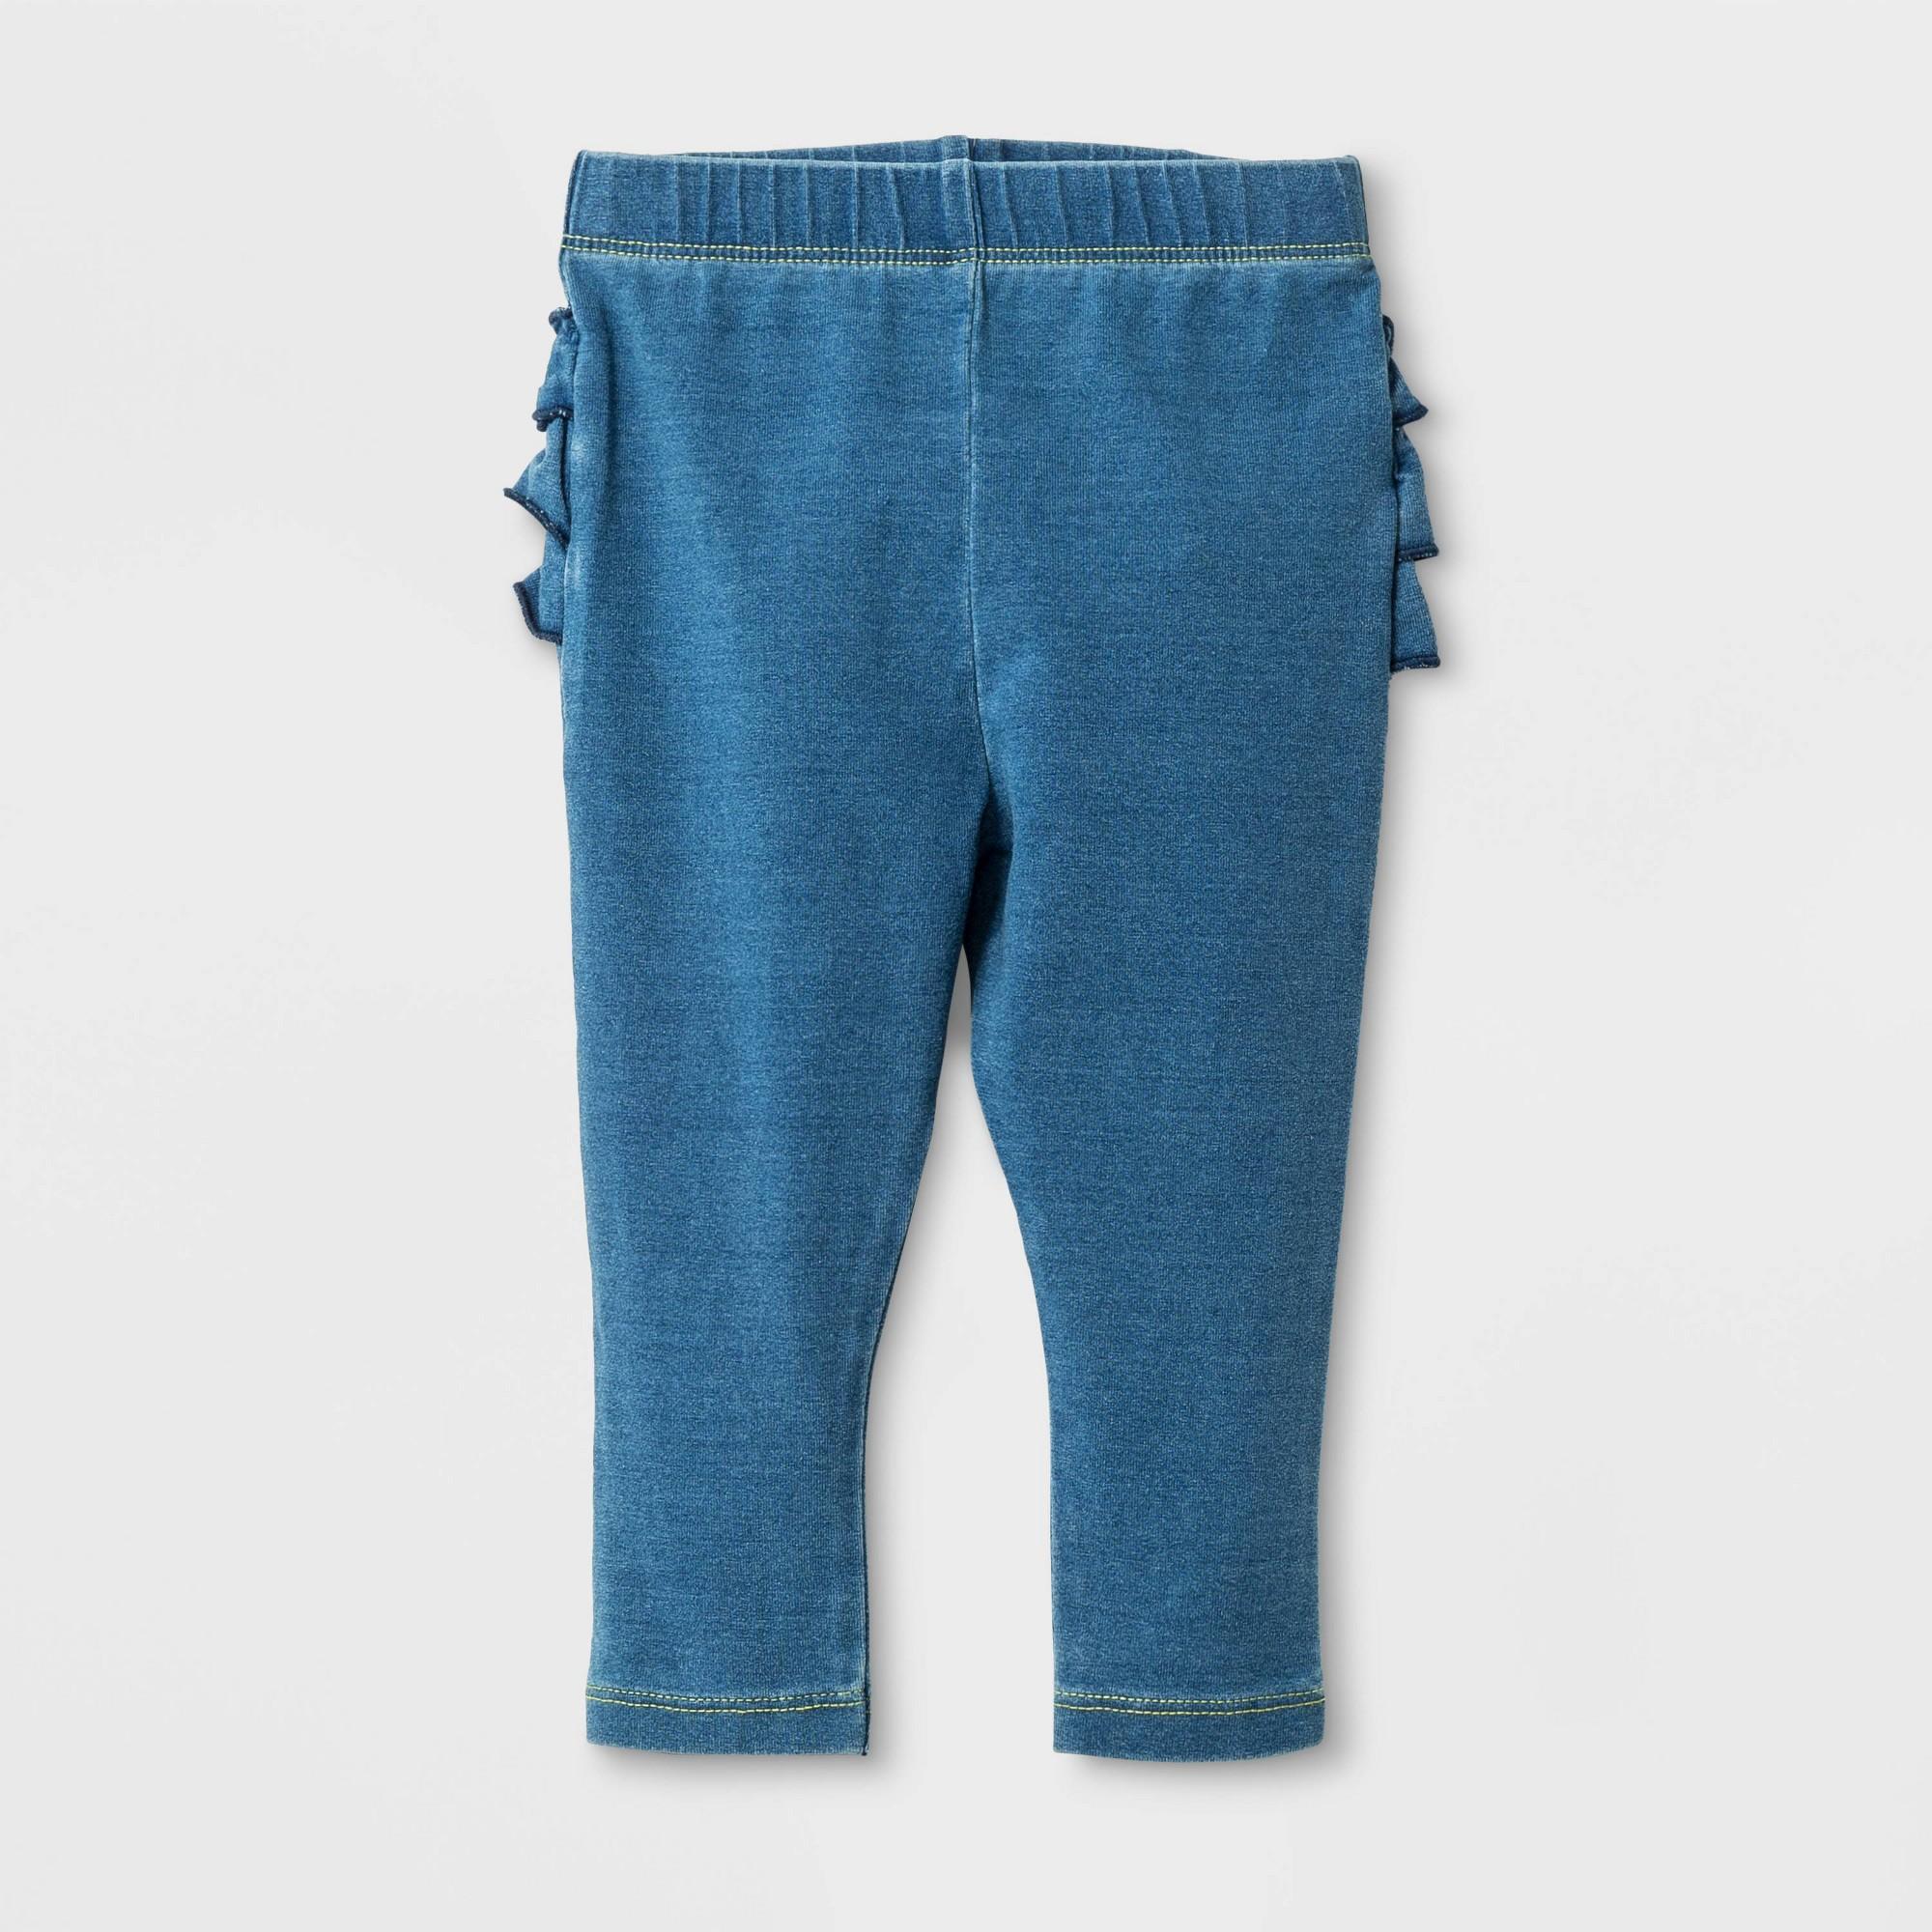 Baby Girls' Ruffle Bum Faux Denim Jeans - Cat & Jack Medium Wash Newborn, Blue